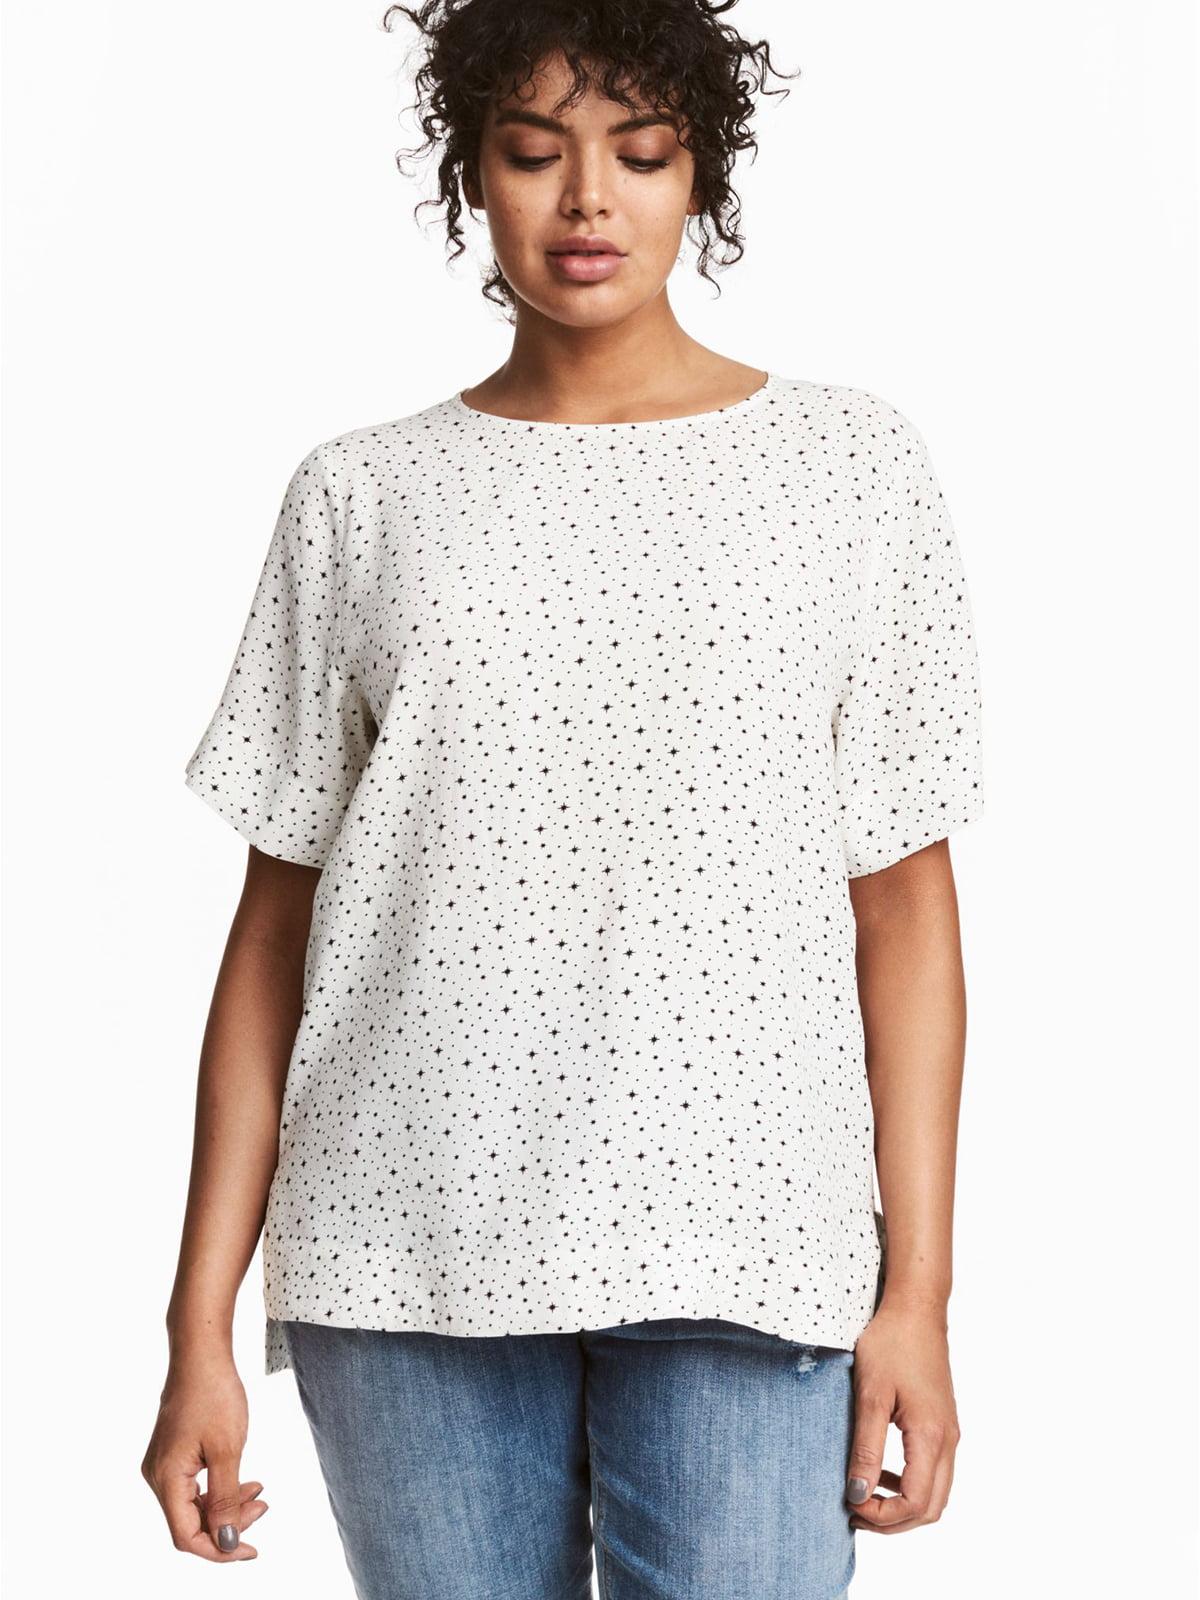 Блуза біла з принтом | 5677121